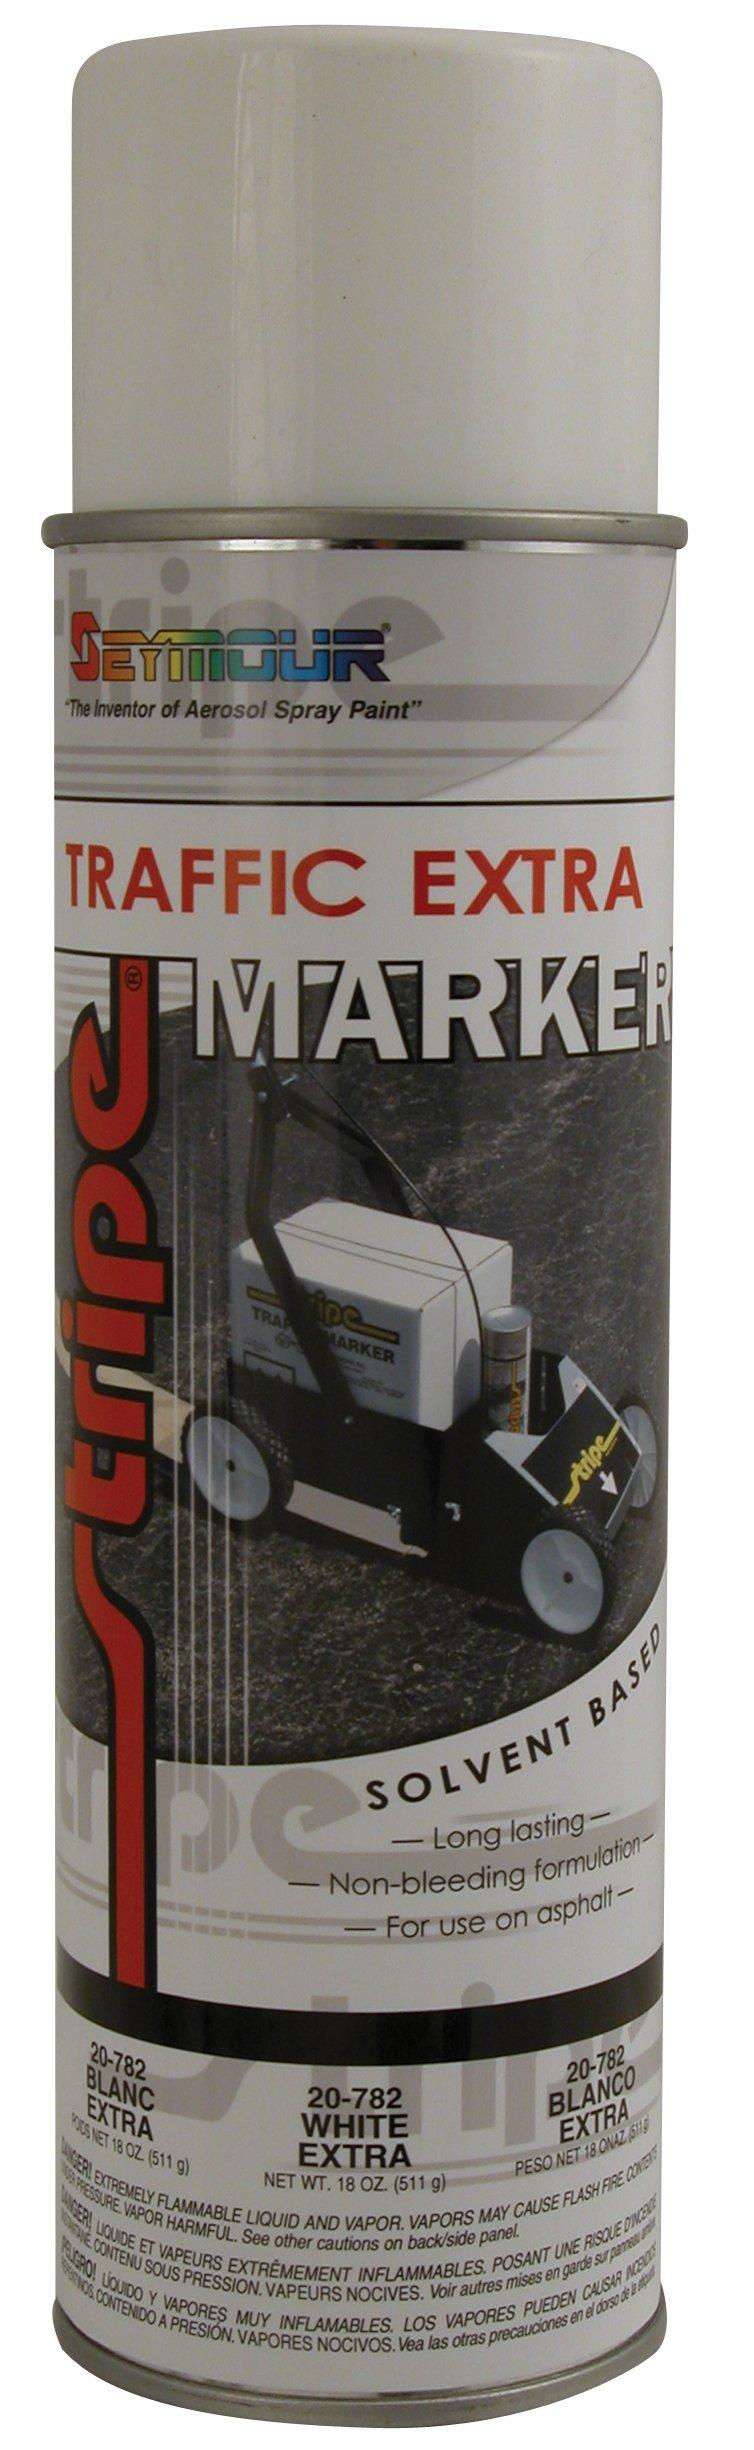 Seymour 20-782 Stripe Solvent Base Extra Traffic Marker, White